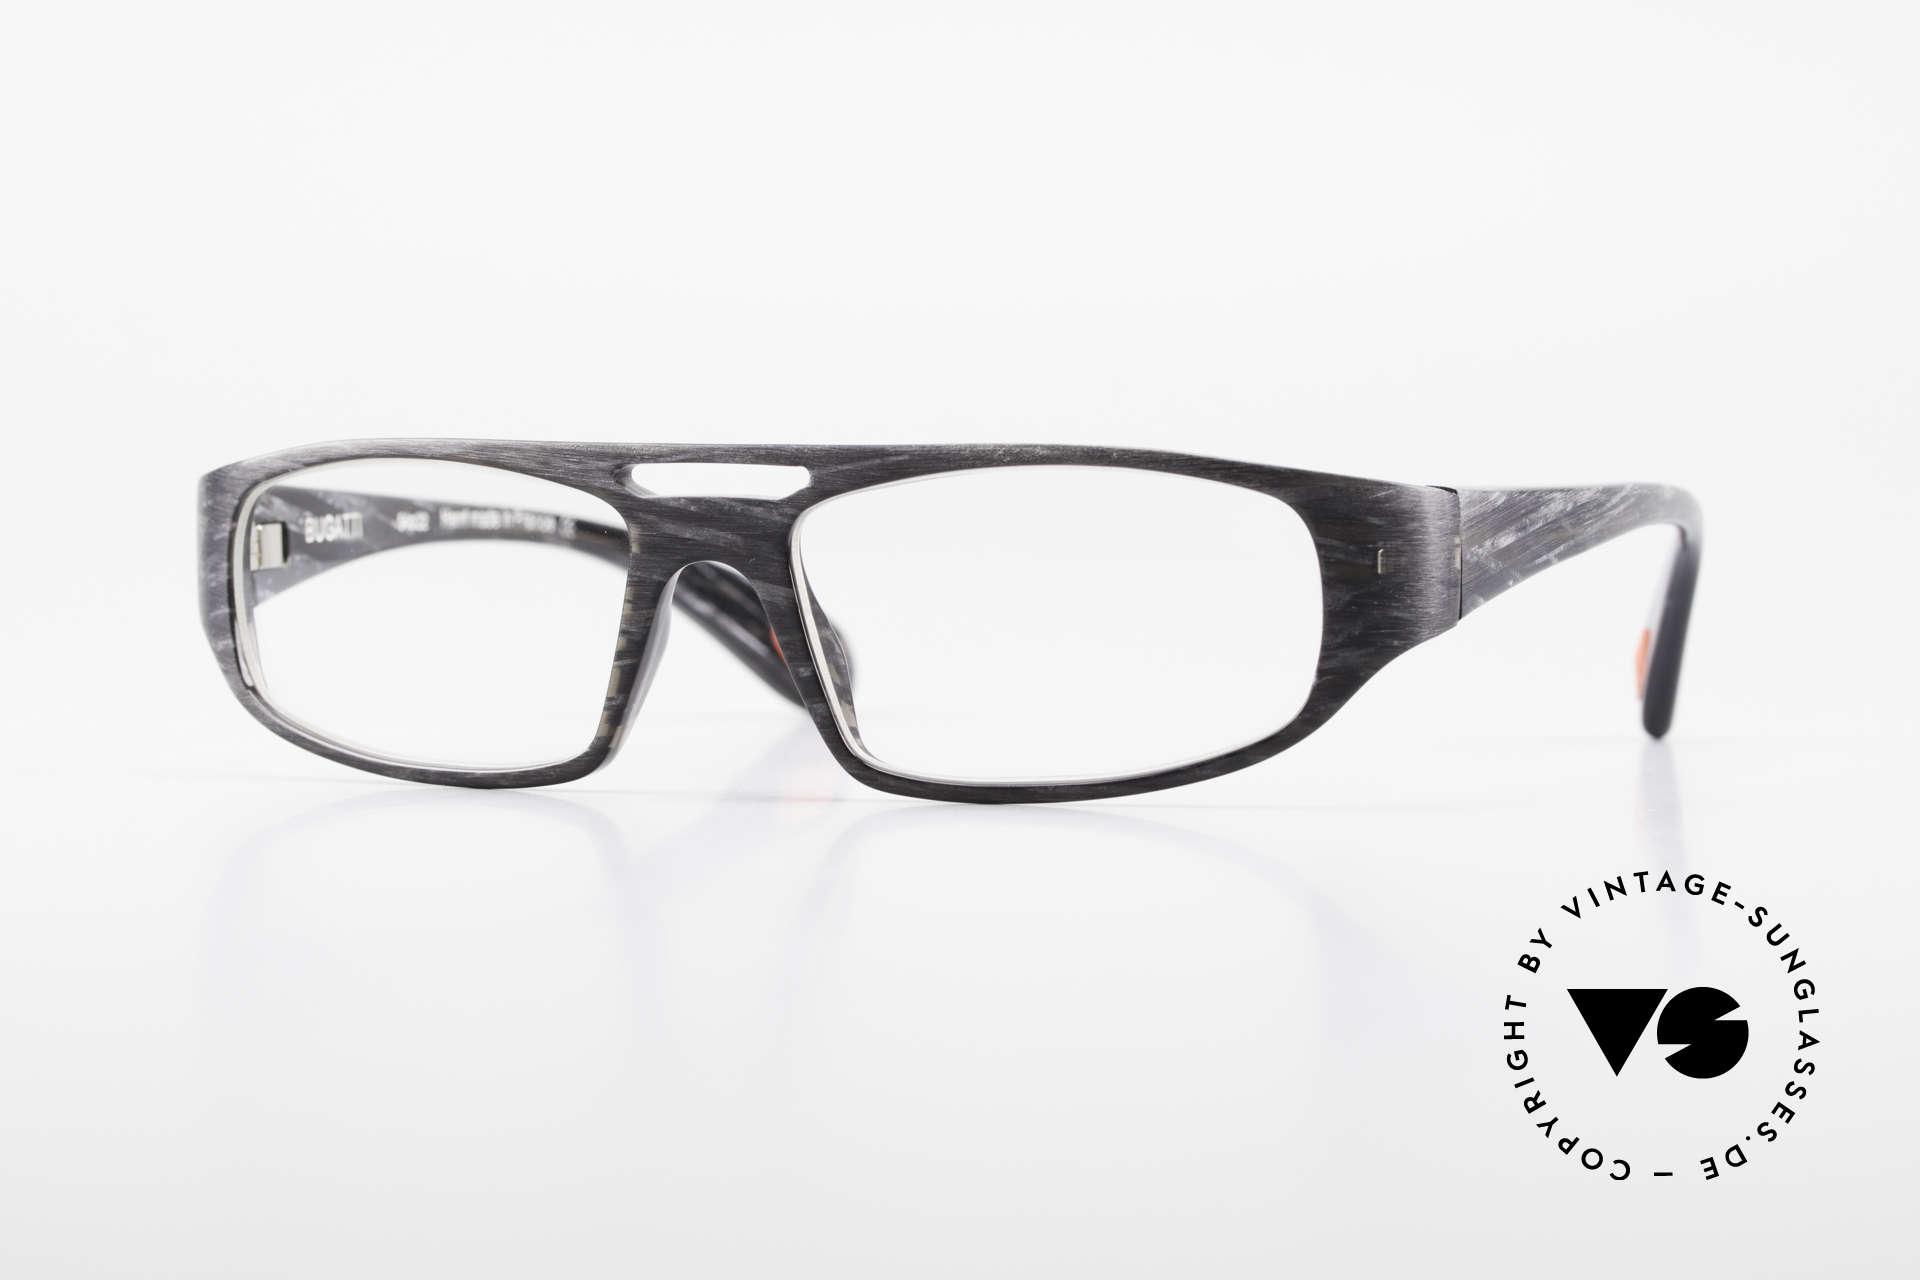 Bugatti 222 Striking Designer Spectacles, striking vintage eyeglass-frame by BUGATTI, Made for Men